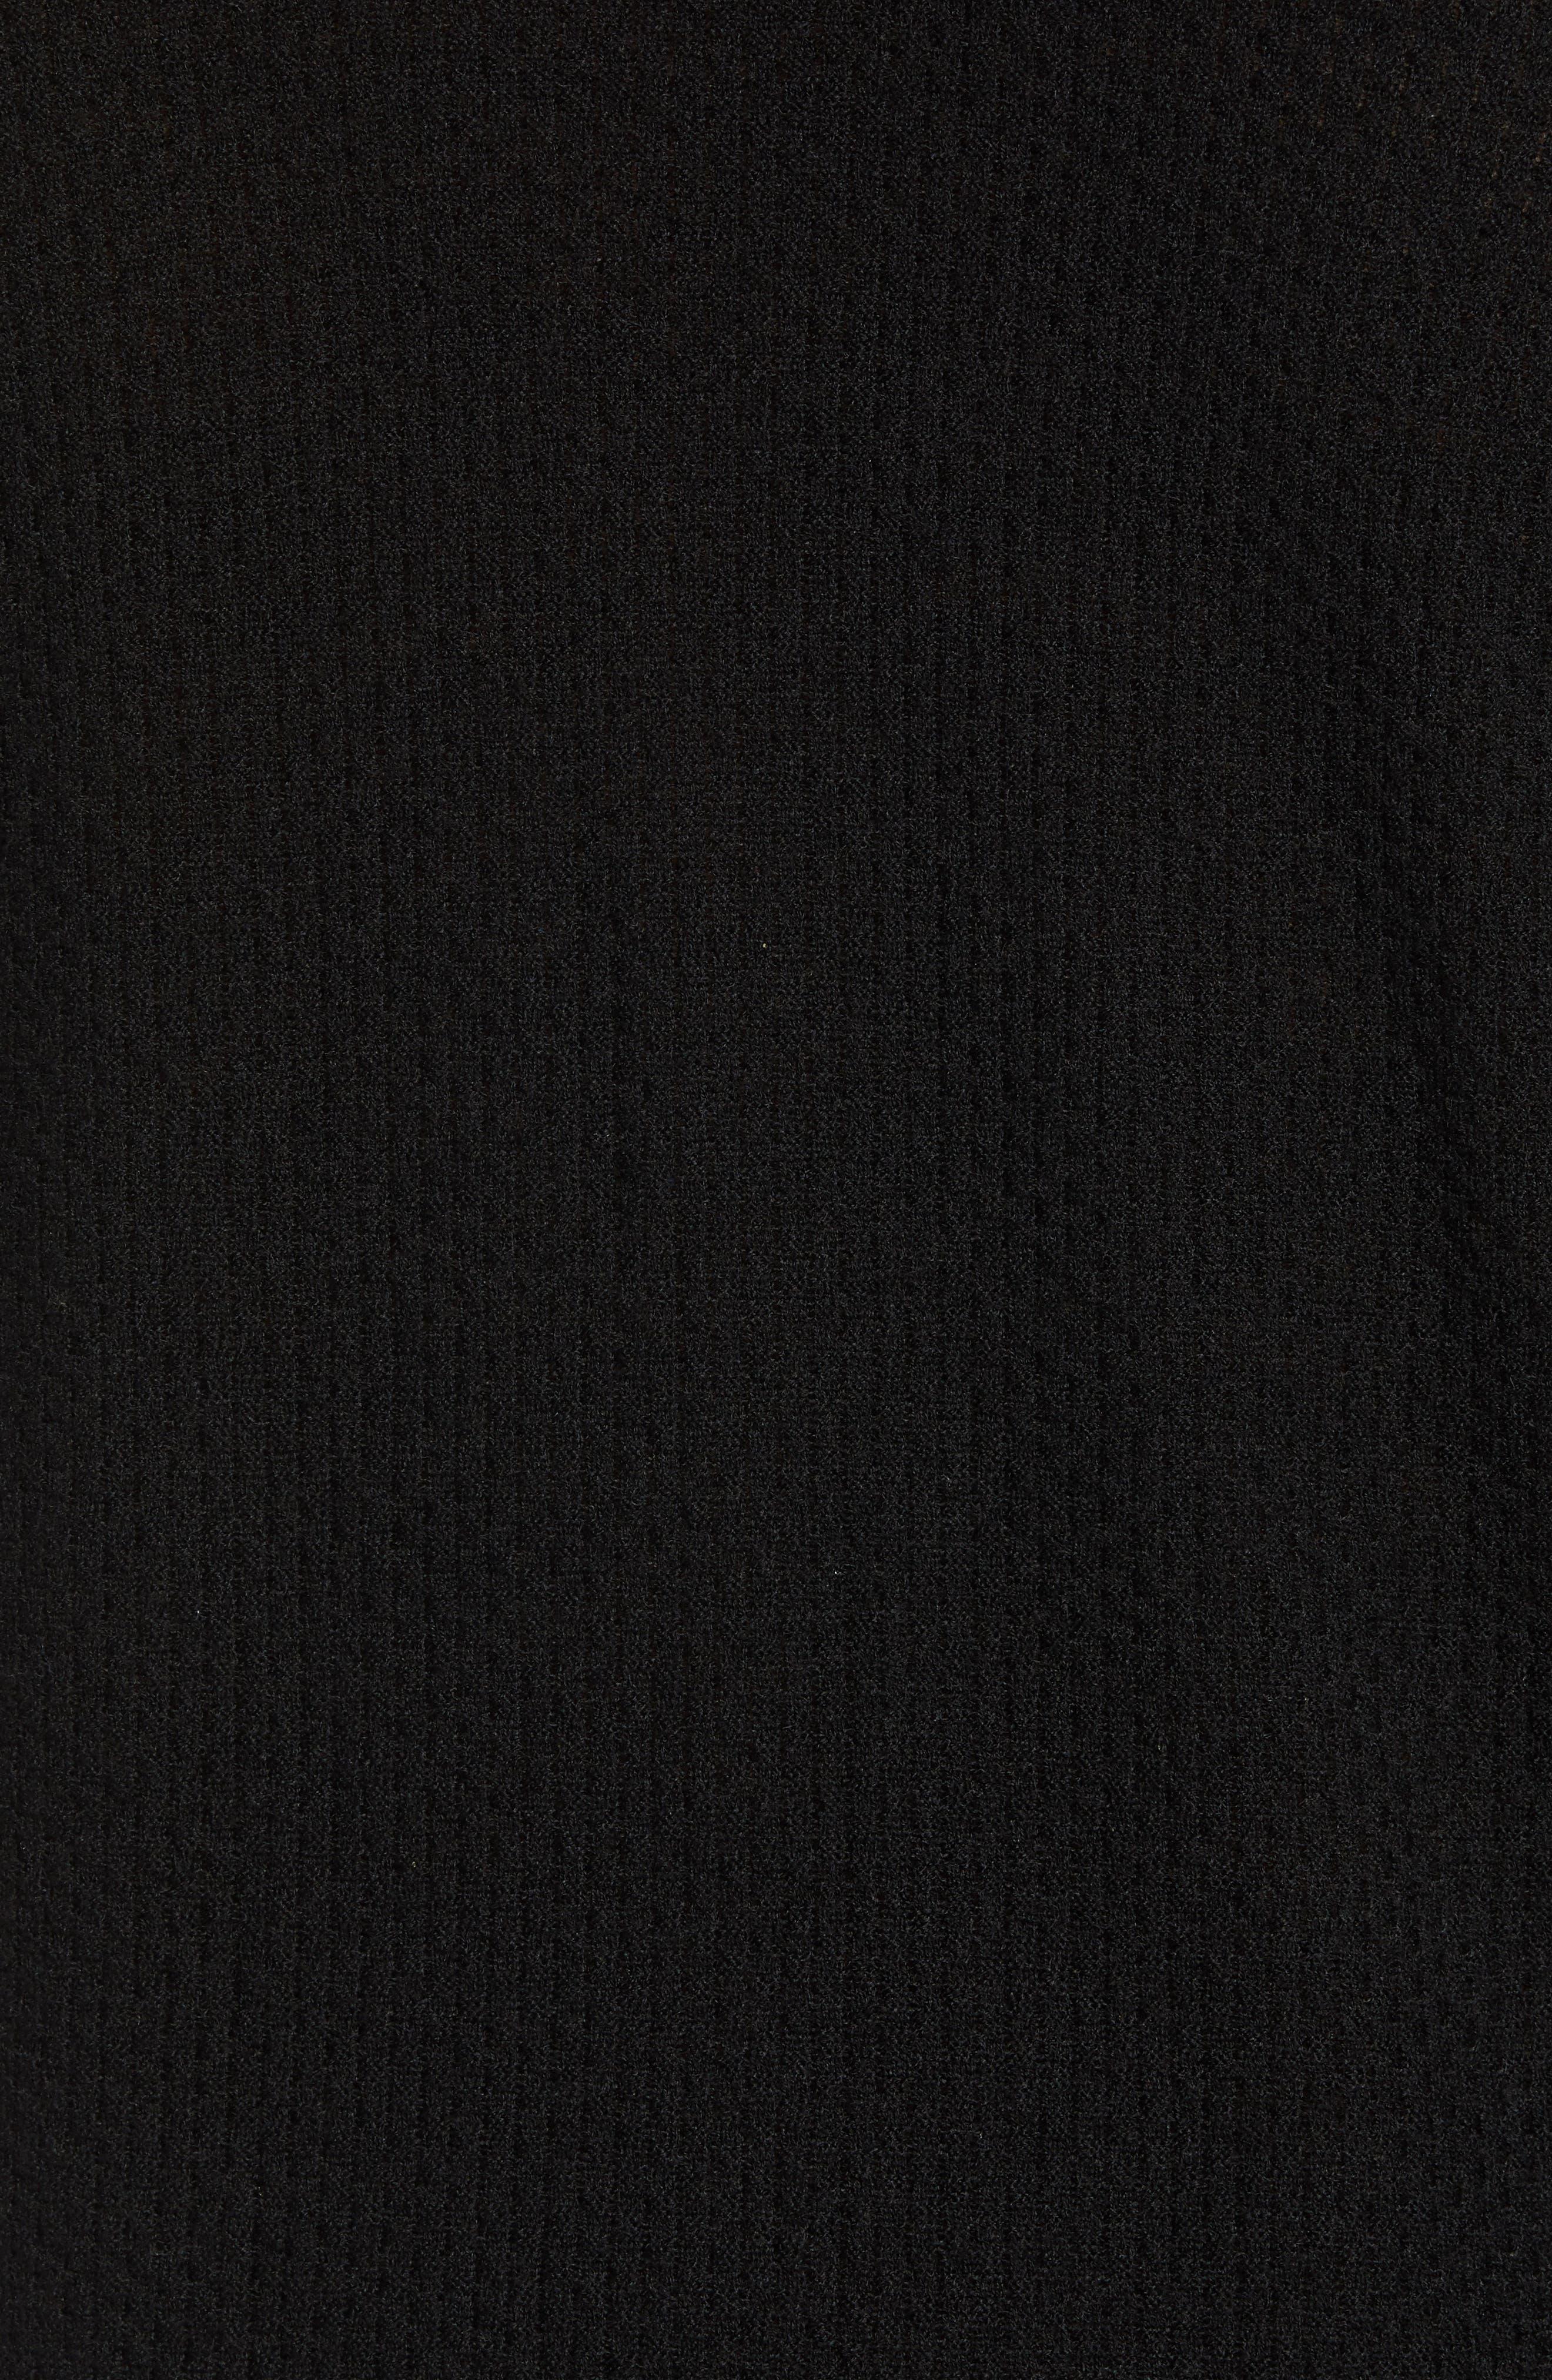 Capilene<sup>®</sup> Air Hoodie,                             Alternate thumbnail 5, color,                             BLACK